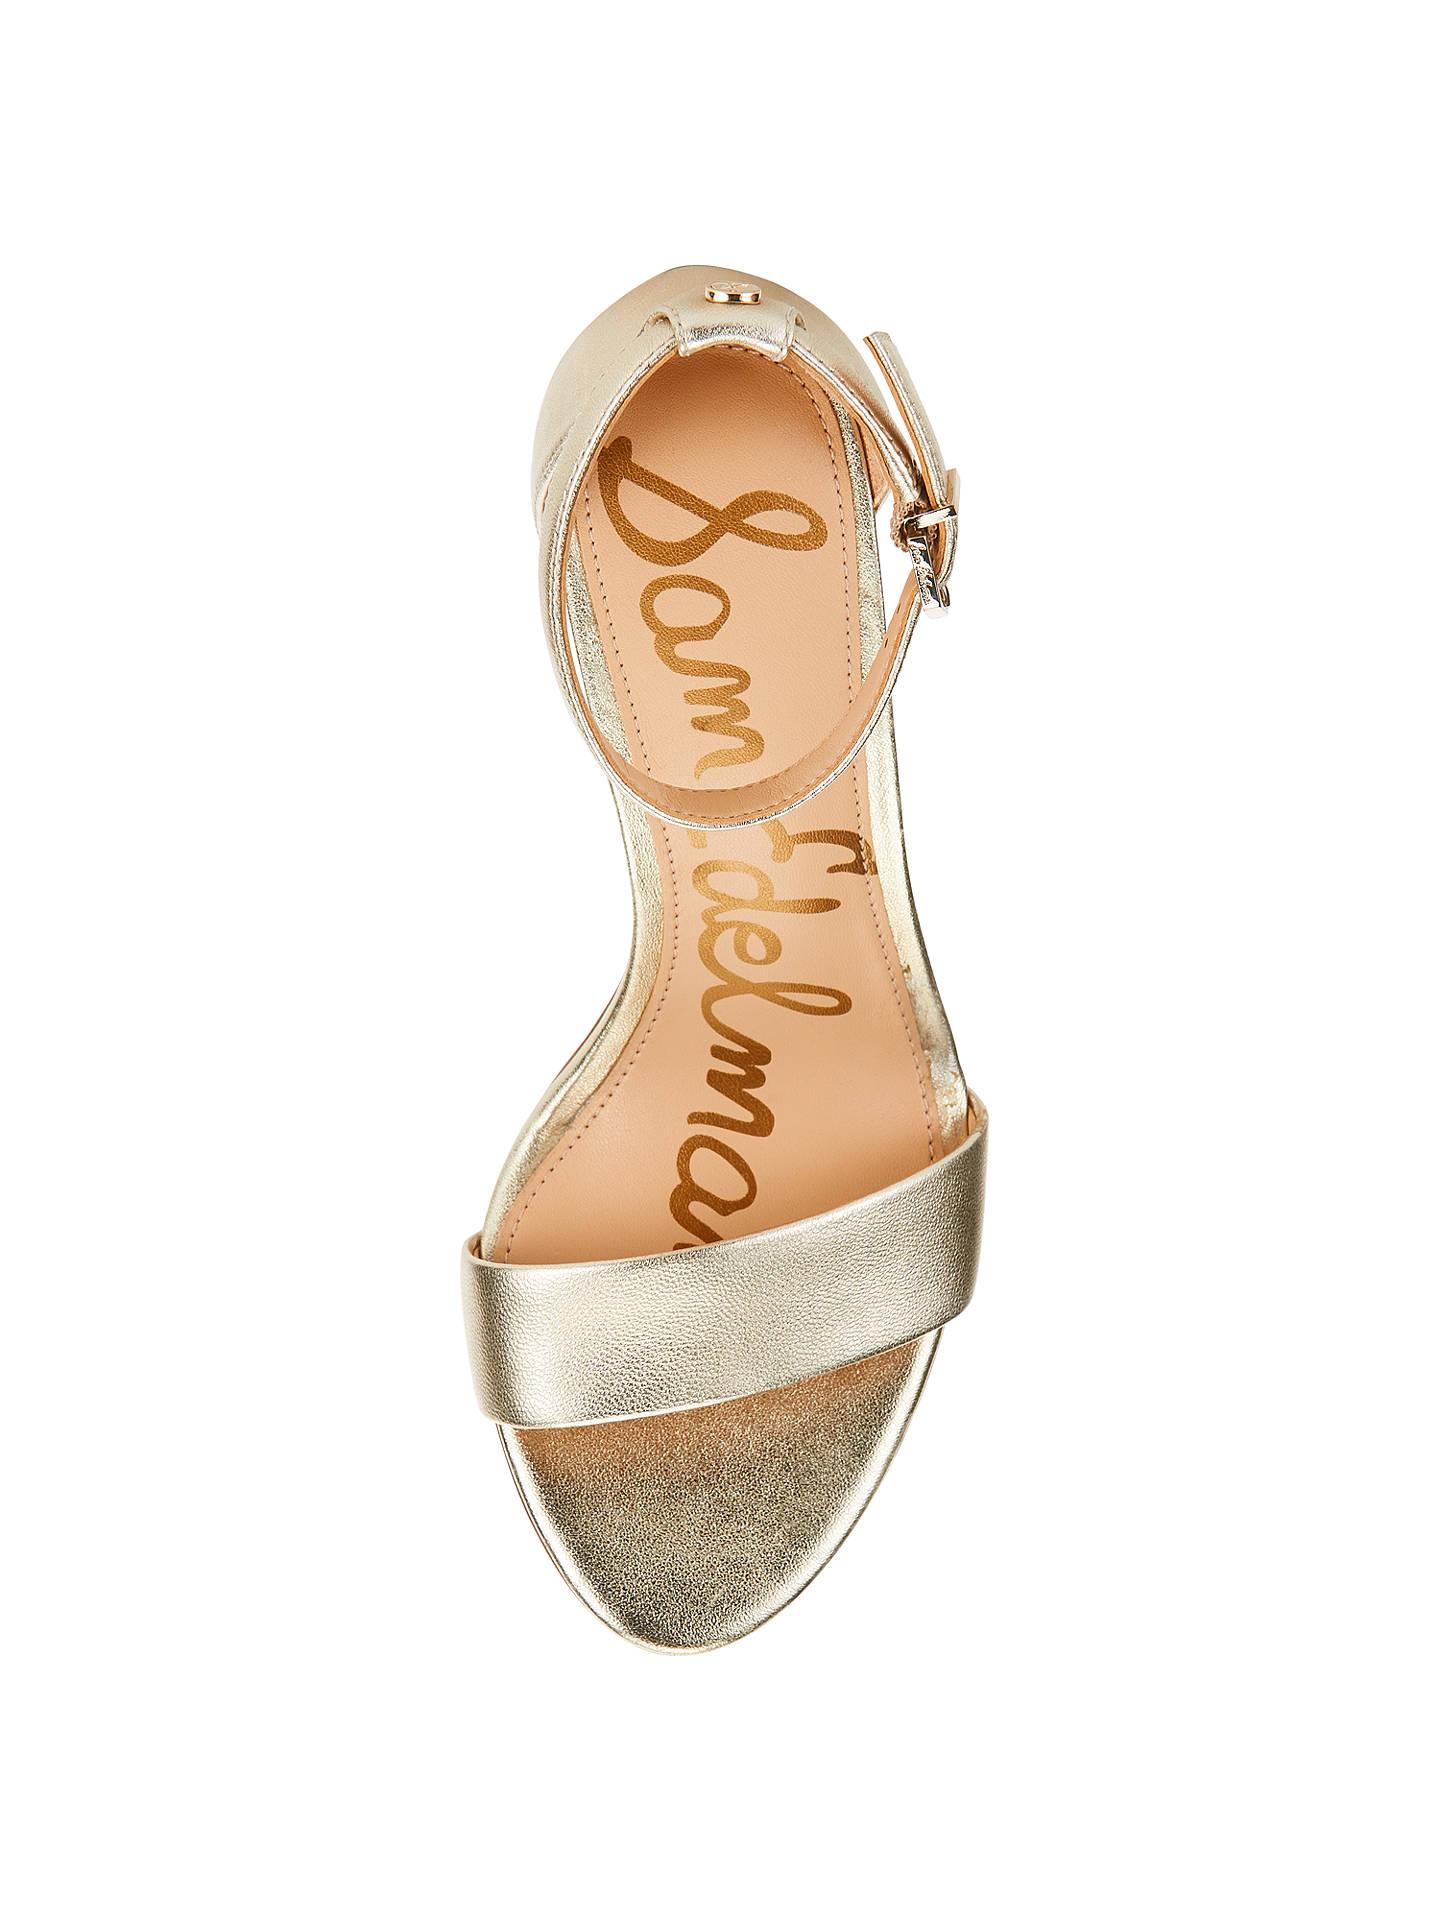 4f664805fdb Sam Edelman Yaro Block Heeled Sandals, Light Gold at John Lewis ...